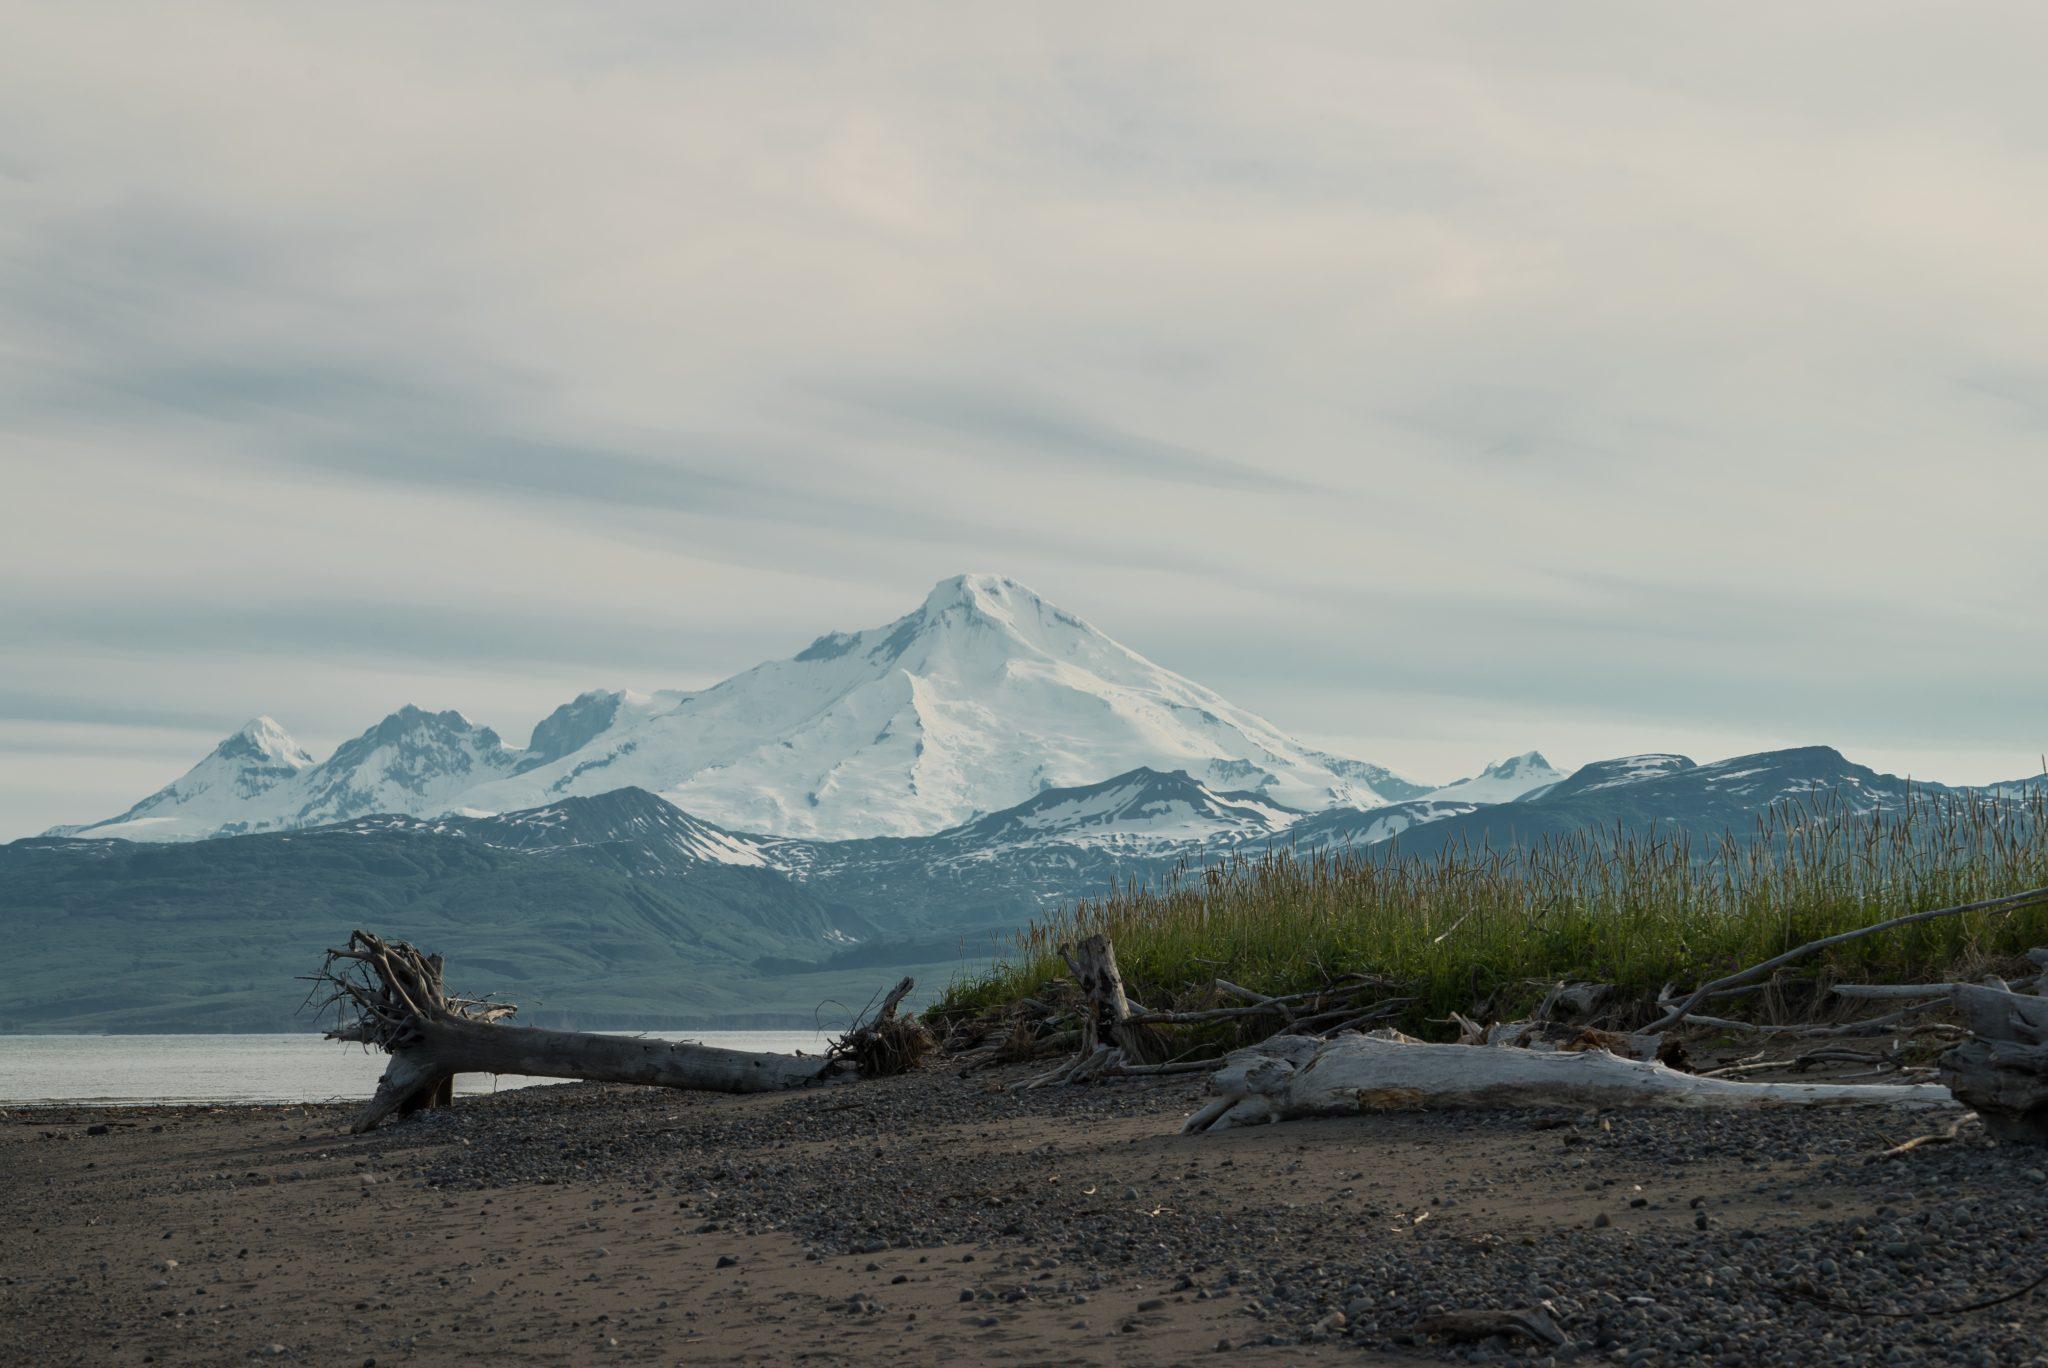 alaska-crescent-river-iliamna-mountain-vacation-fishing-salmon-snug-harbor-DSC06875